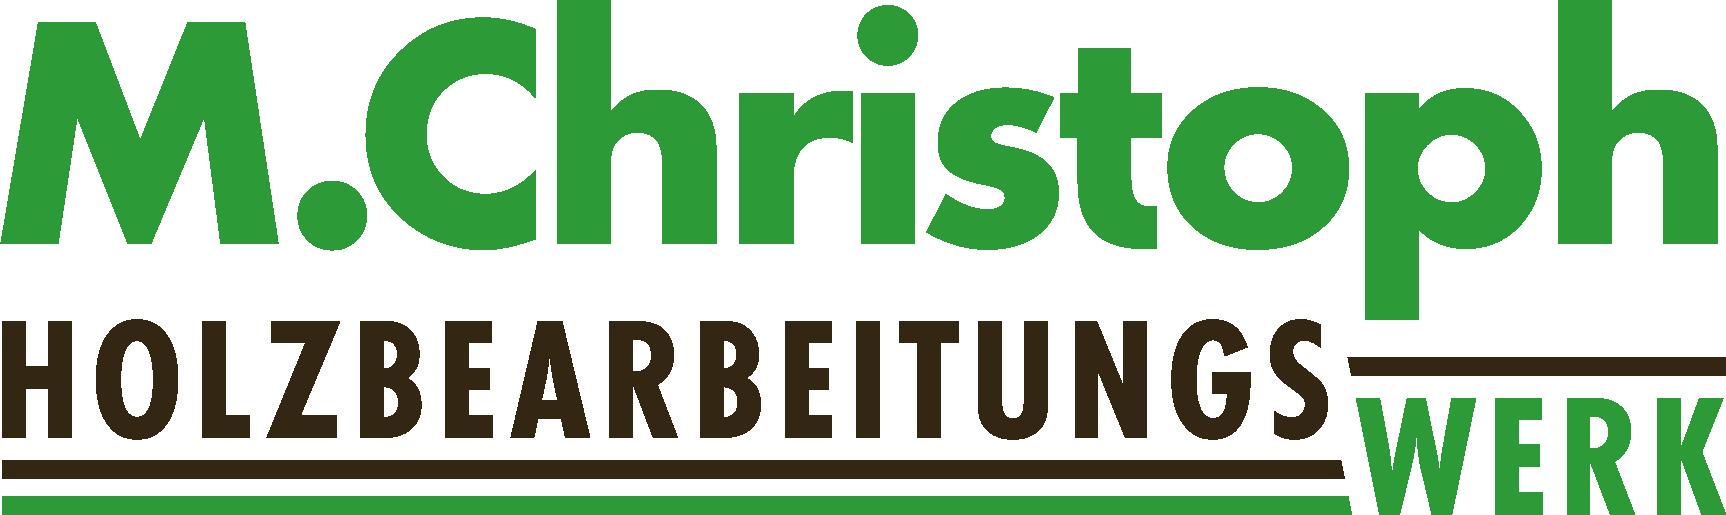 M. Christoph GmbH & Co. KG